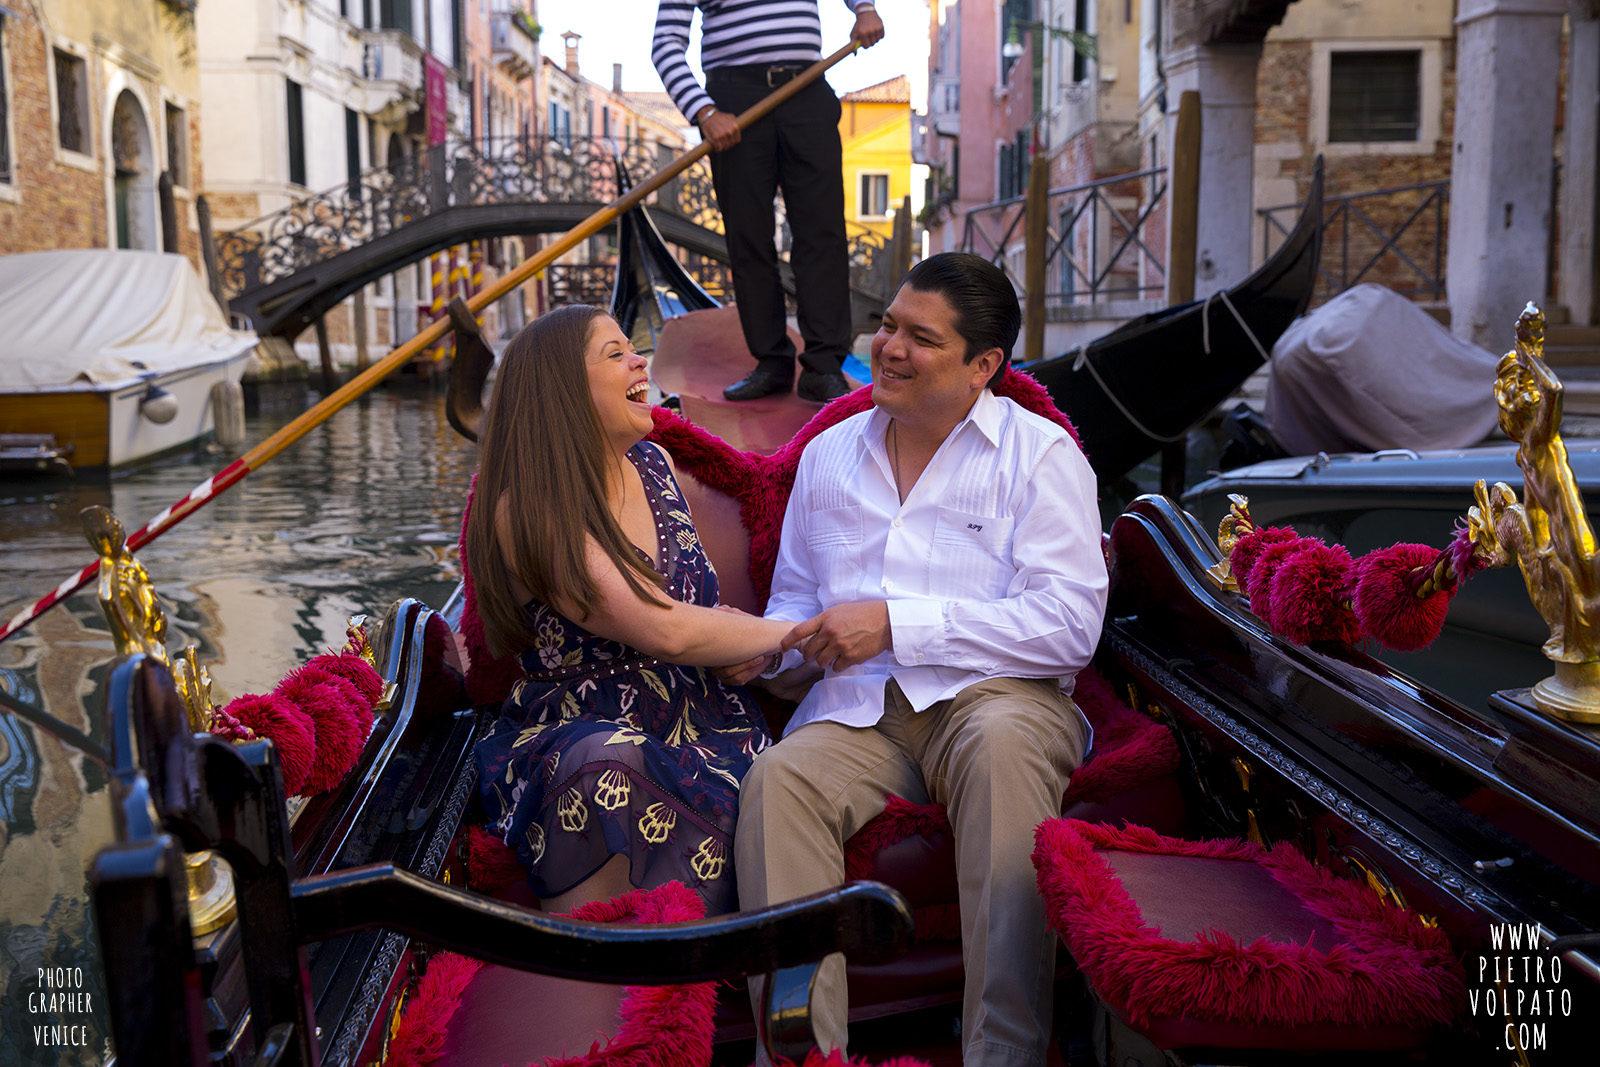 venice-engagement-photographer-photoshoot-for-couple-romantic-vacation-walk-tour-20161003_01